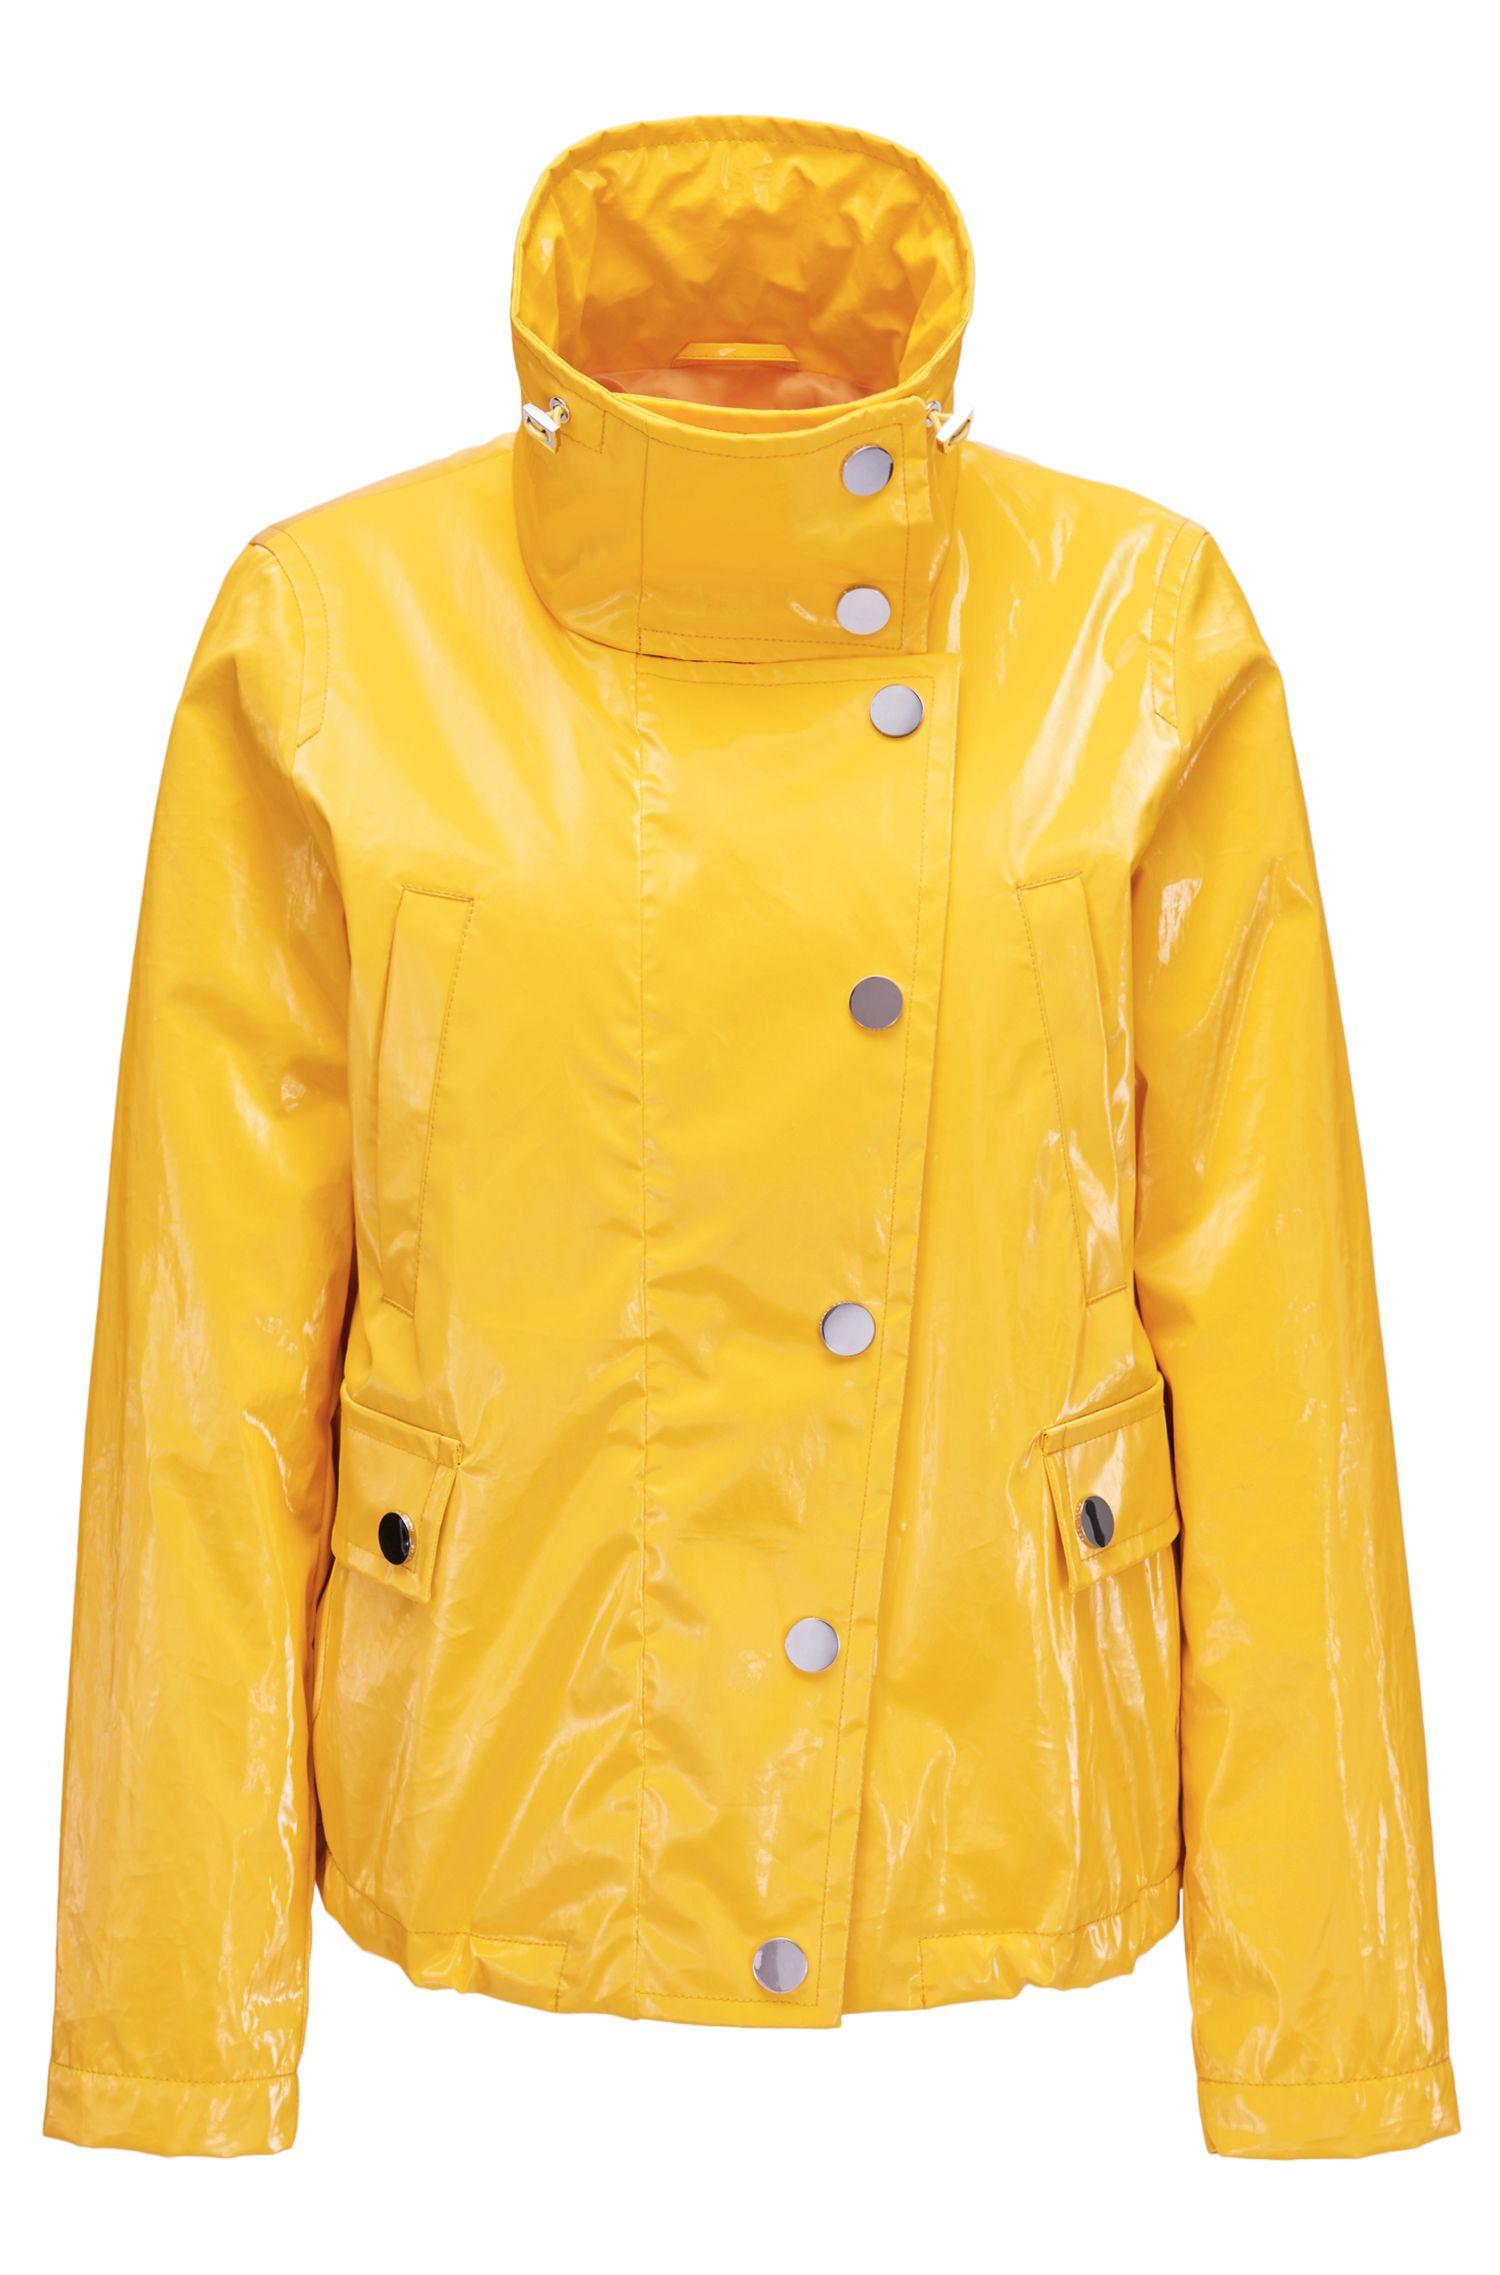 Waxed Cotton Rain Jacket | Pikachuto, Yellow